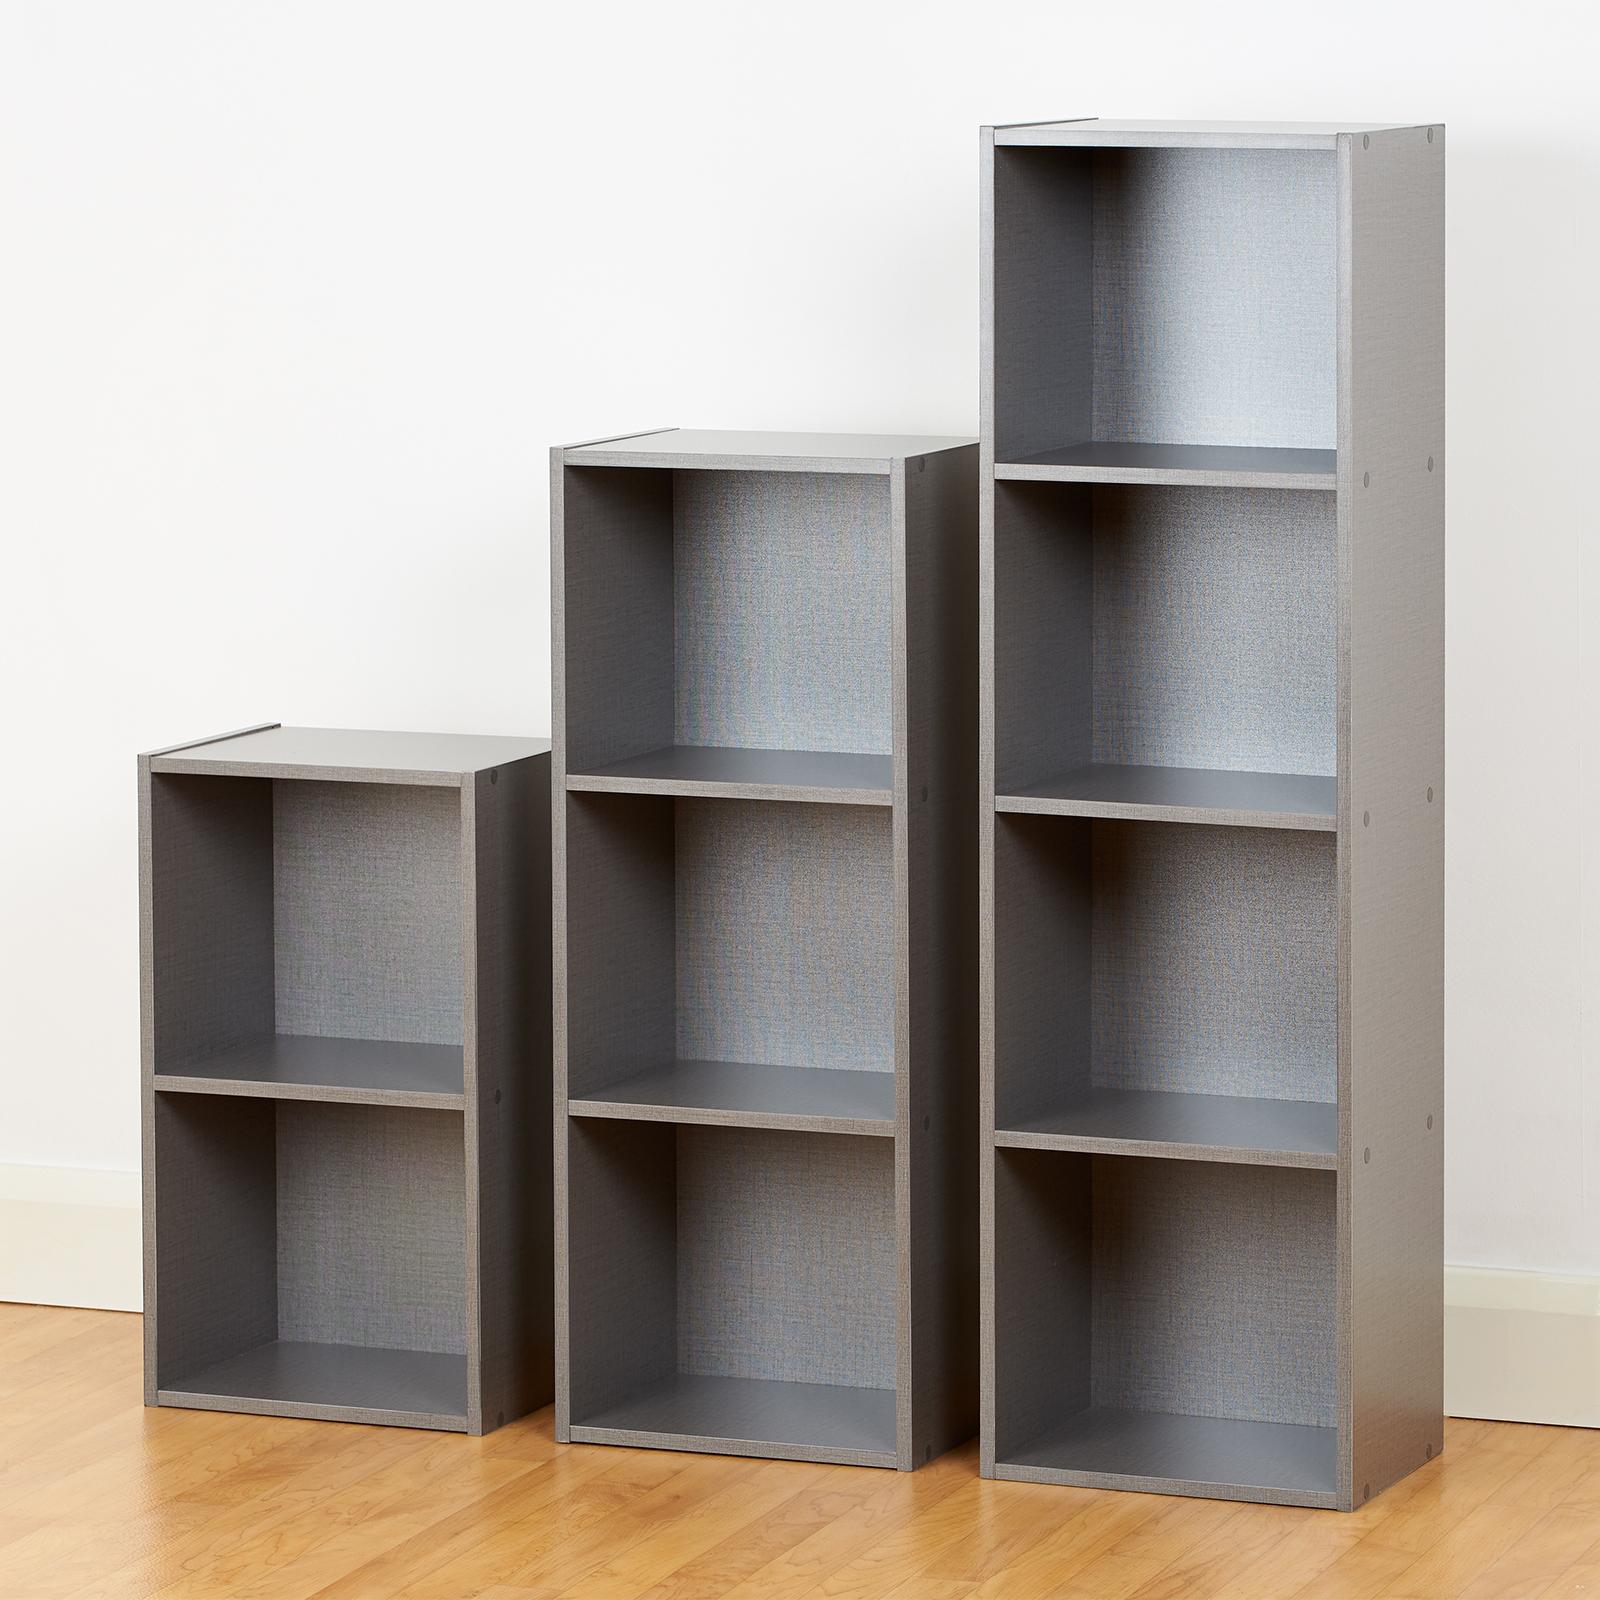 9 Cube Grey Modular Square Wooden Storage Unit 4 Tier